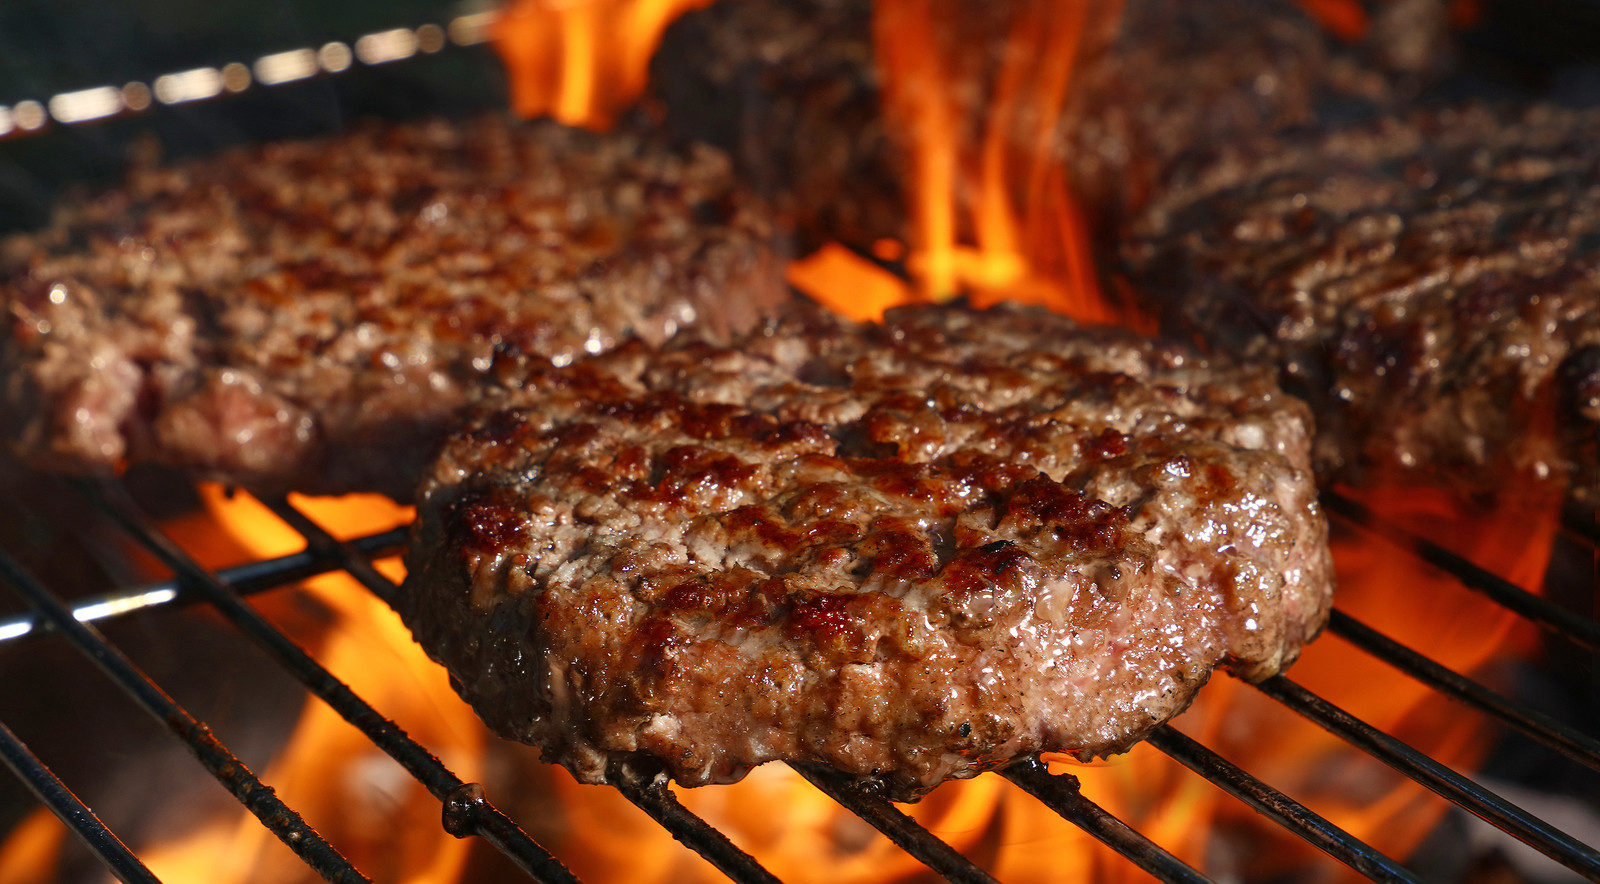 Close Up Beef Or Pork Meat Barbecue Burgers For Hamburger Prepar